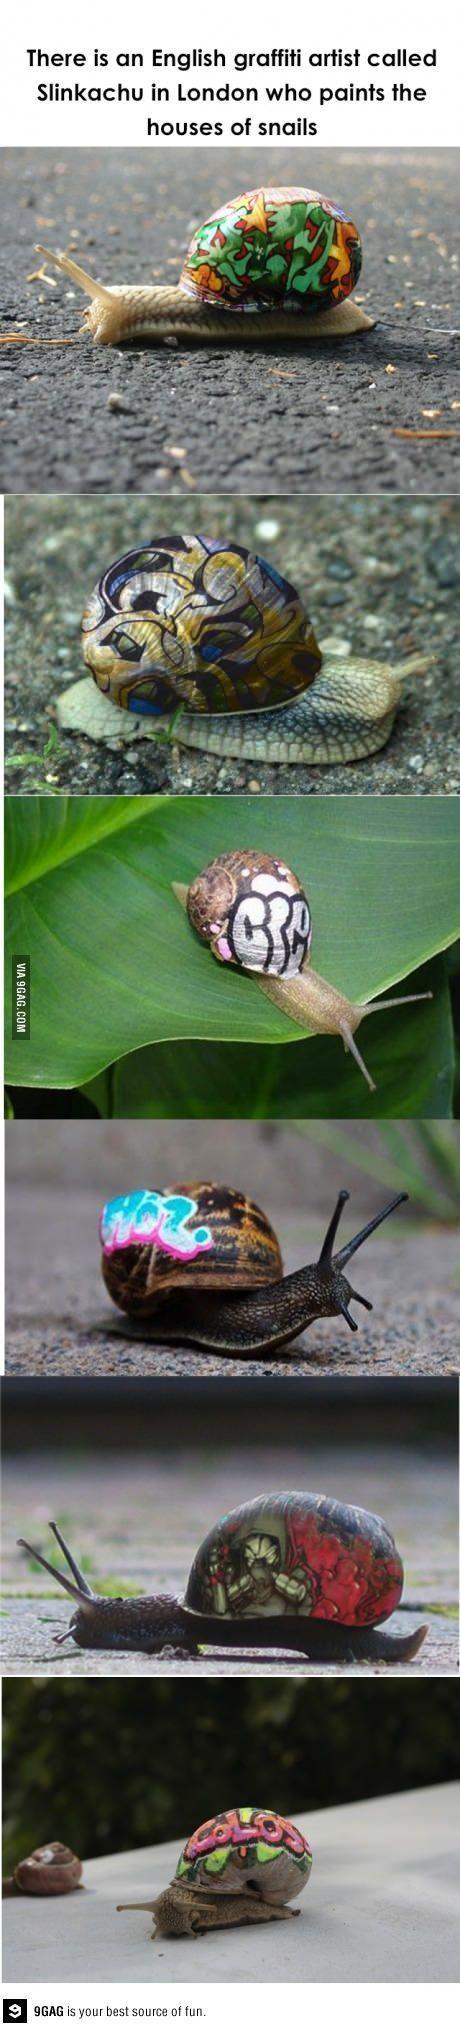 Graffiti snails roaming London as part of slow-mov…